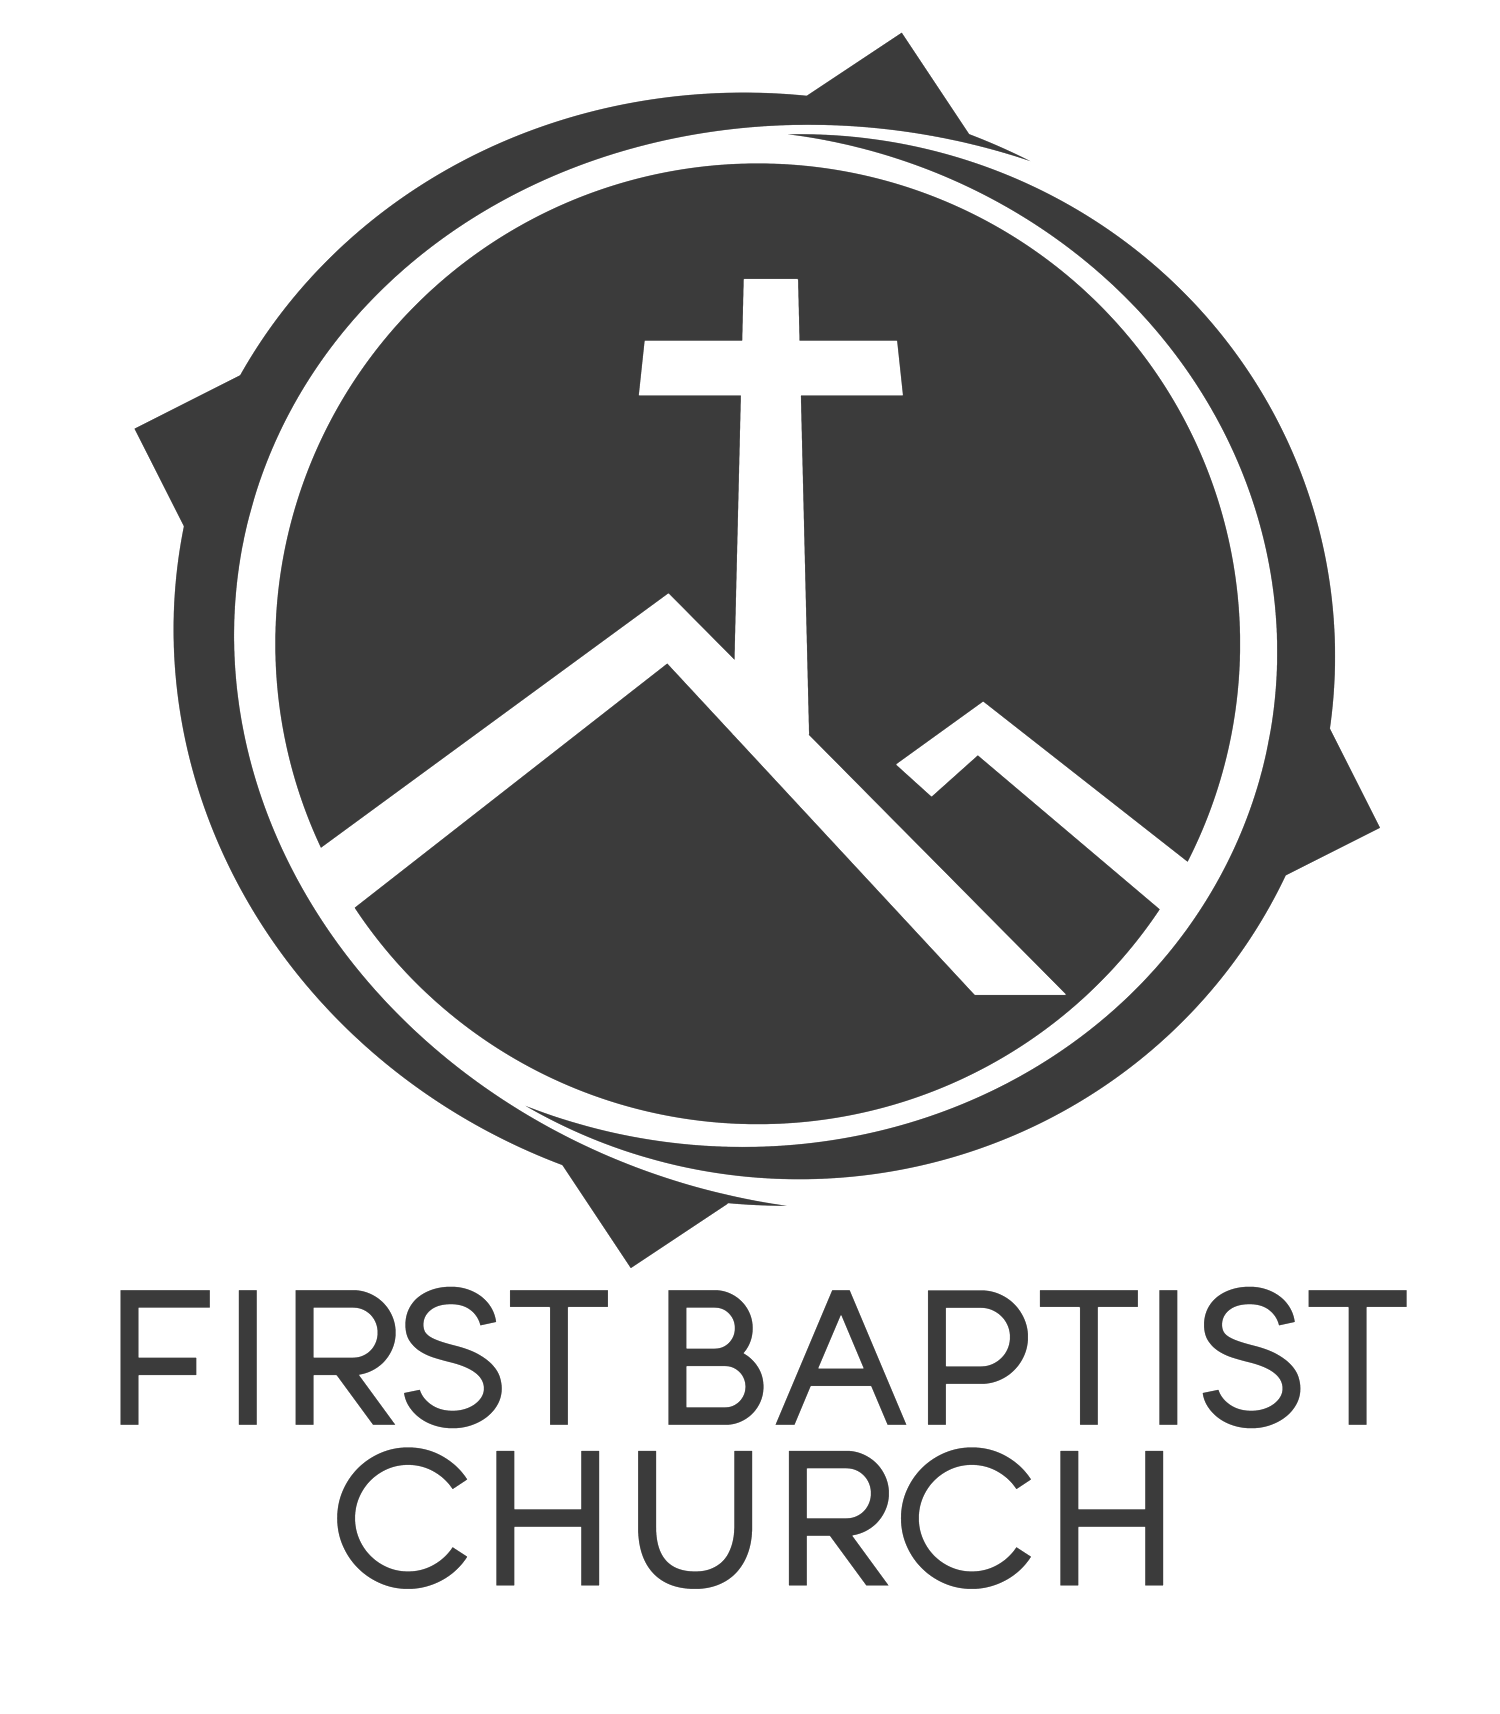 The gospel first baptist church first baptist church biocorpaavc